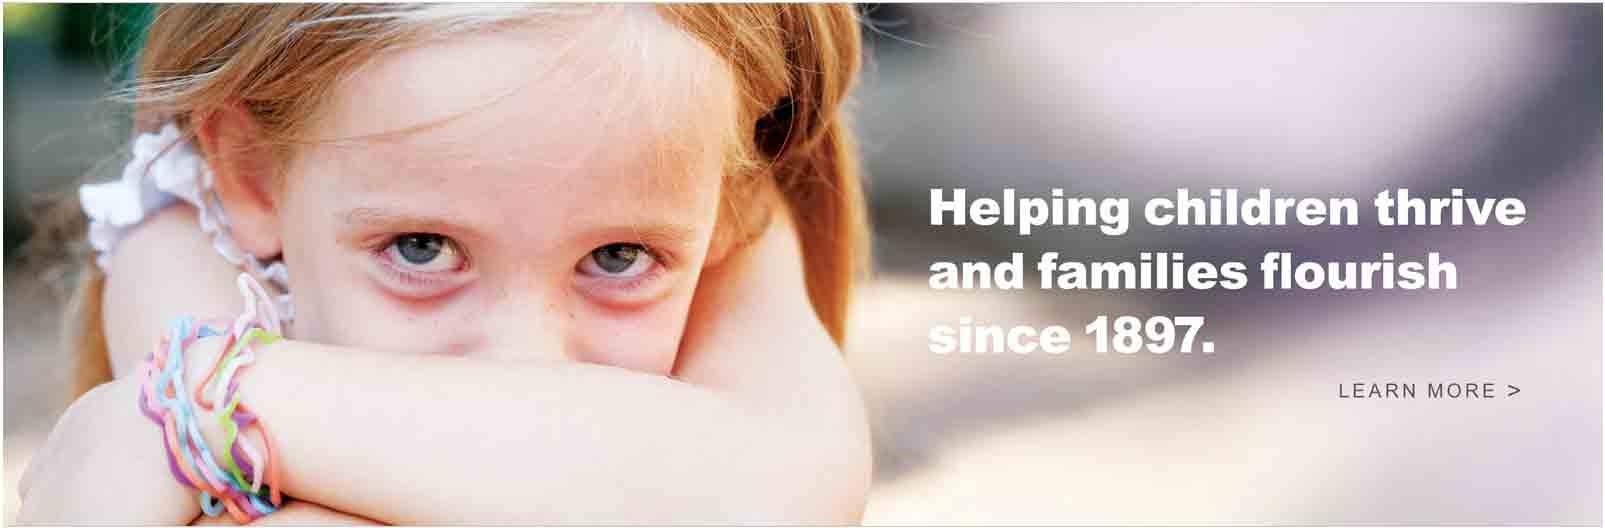 Heph.website-flash-sequence.helpingchildrenthrive.WEB.jpg